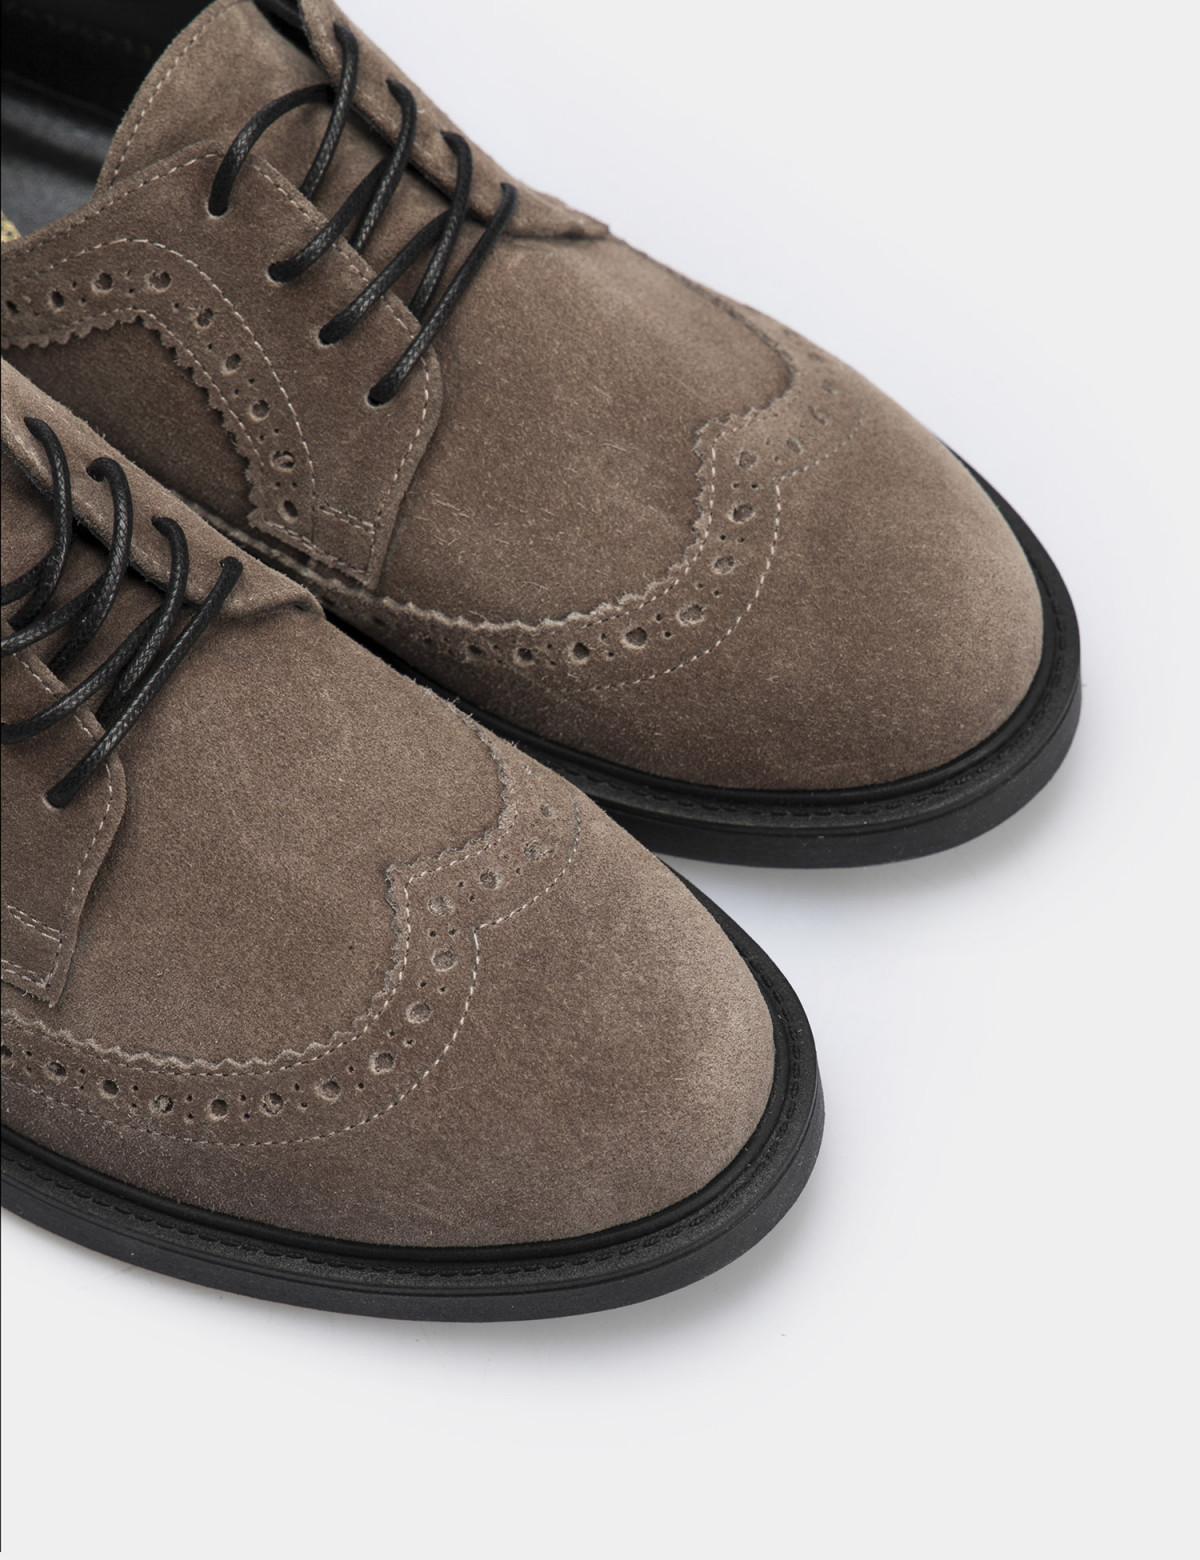 Туфлі темно-бежеві, натуральна замша4